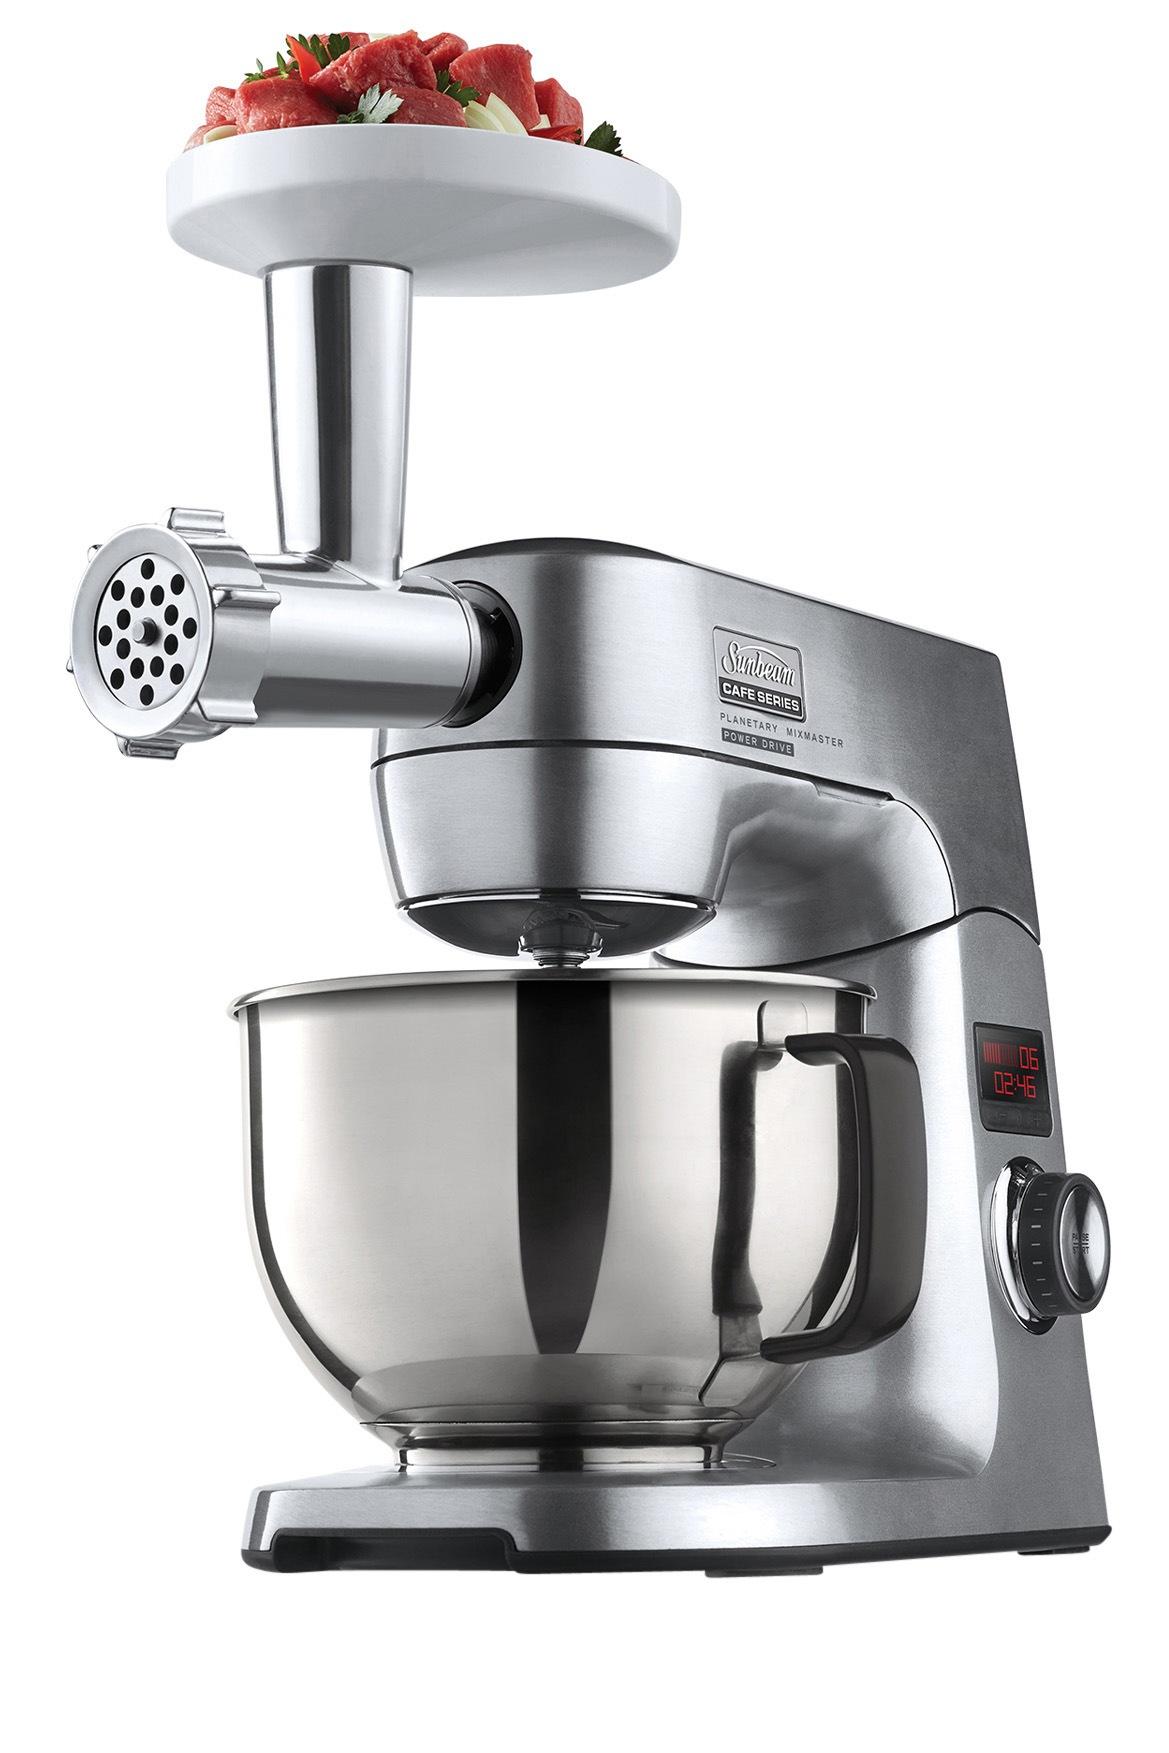 Uncategorized Myer Kitchen Appliances sunbeam mx9550 cafe series mixmaster and multi grinder myer online categoryname